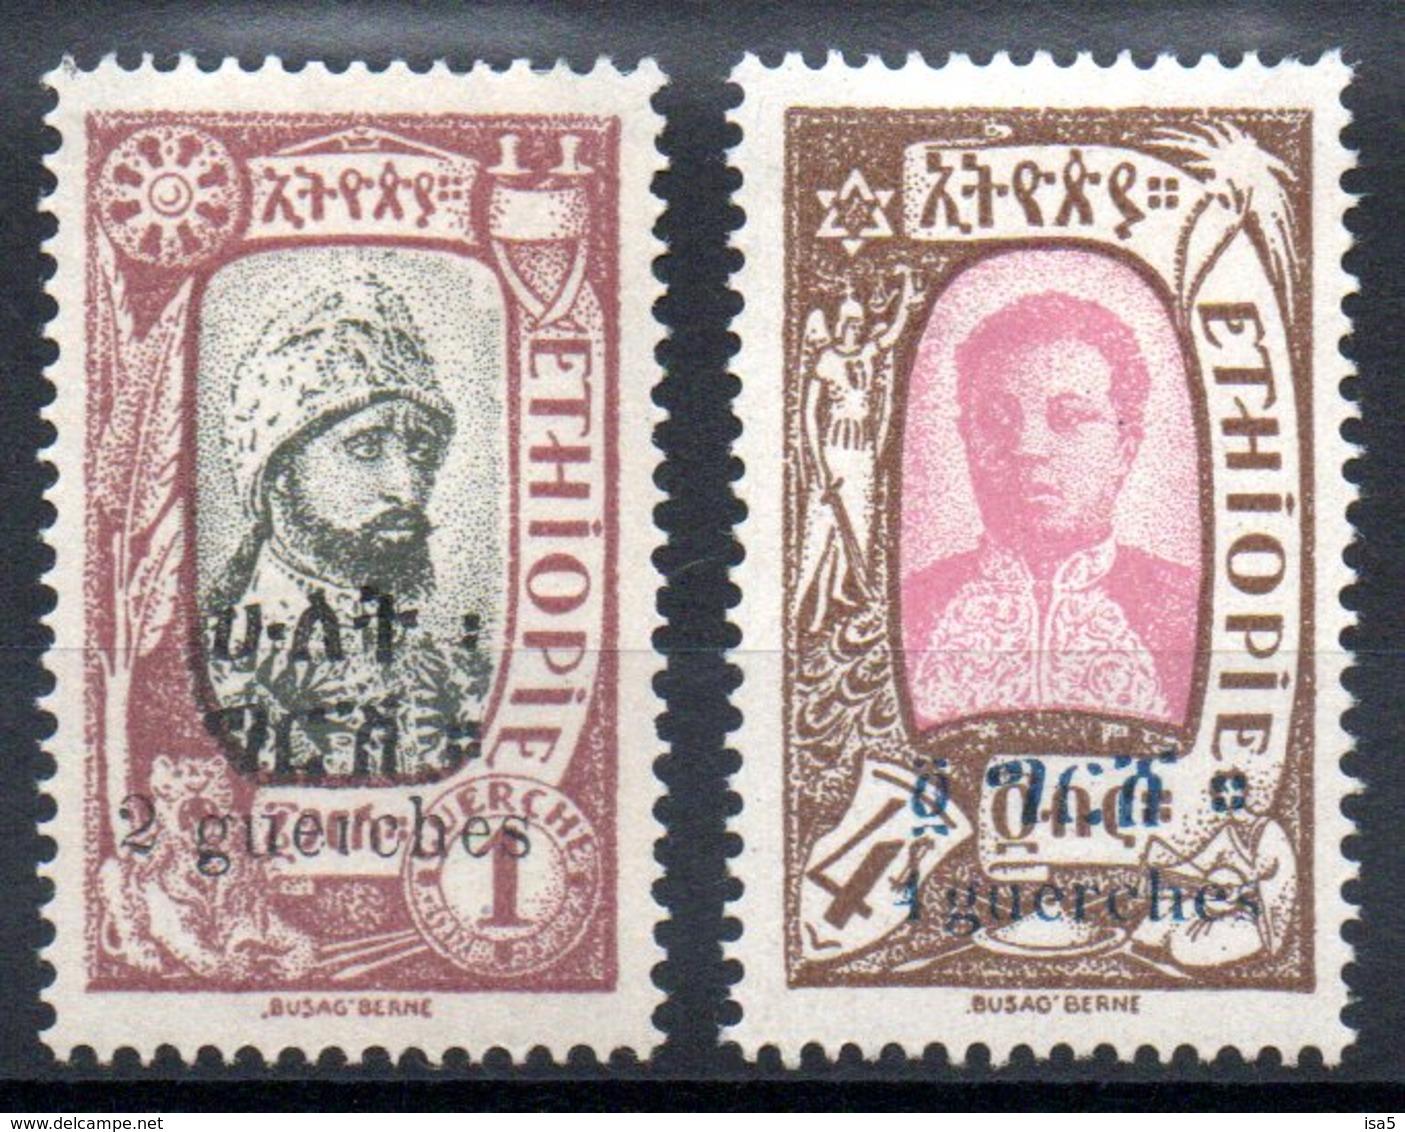 ETHIOPIE - YT N° 134A + 137 - Neufs * - MH - Cote 42,00 € - Etiopía